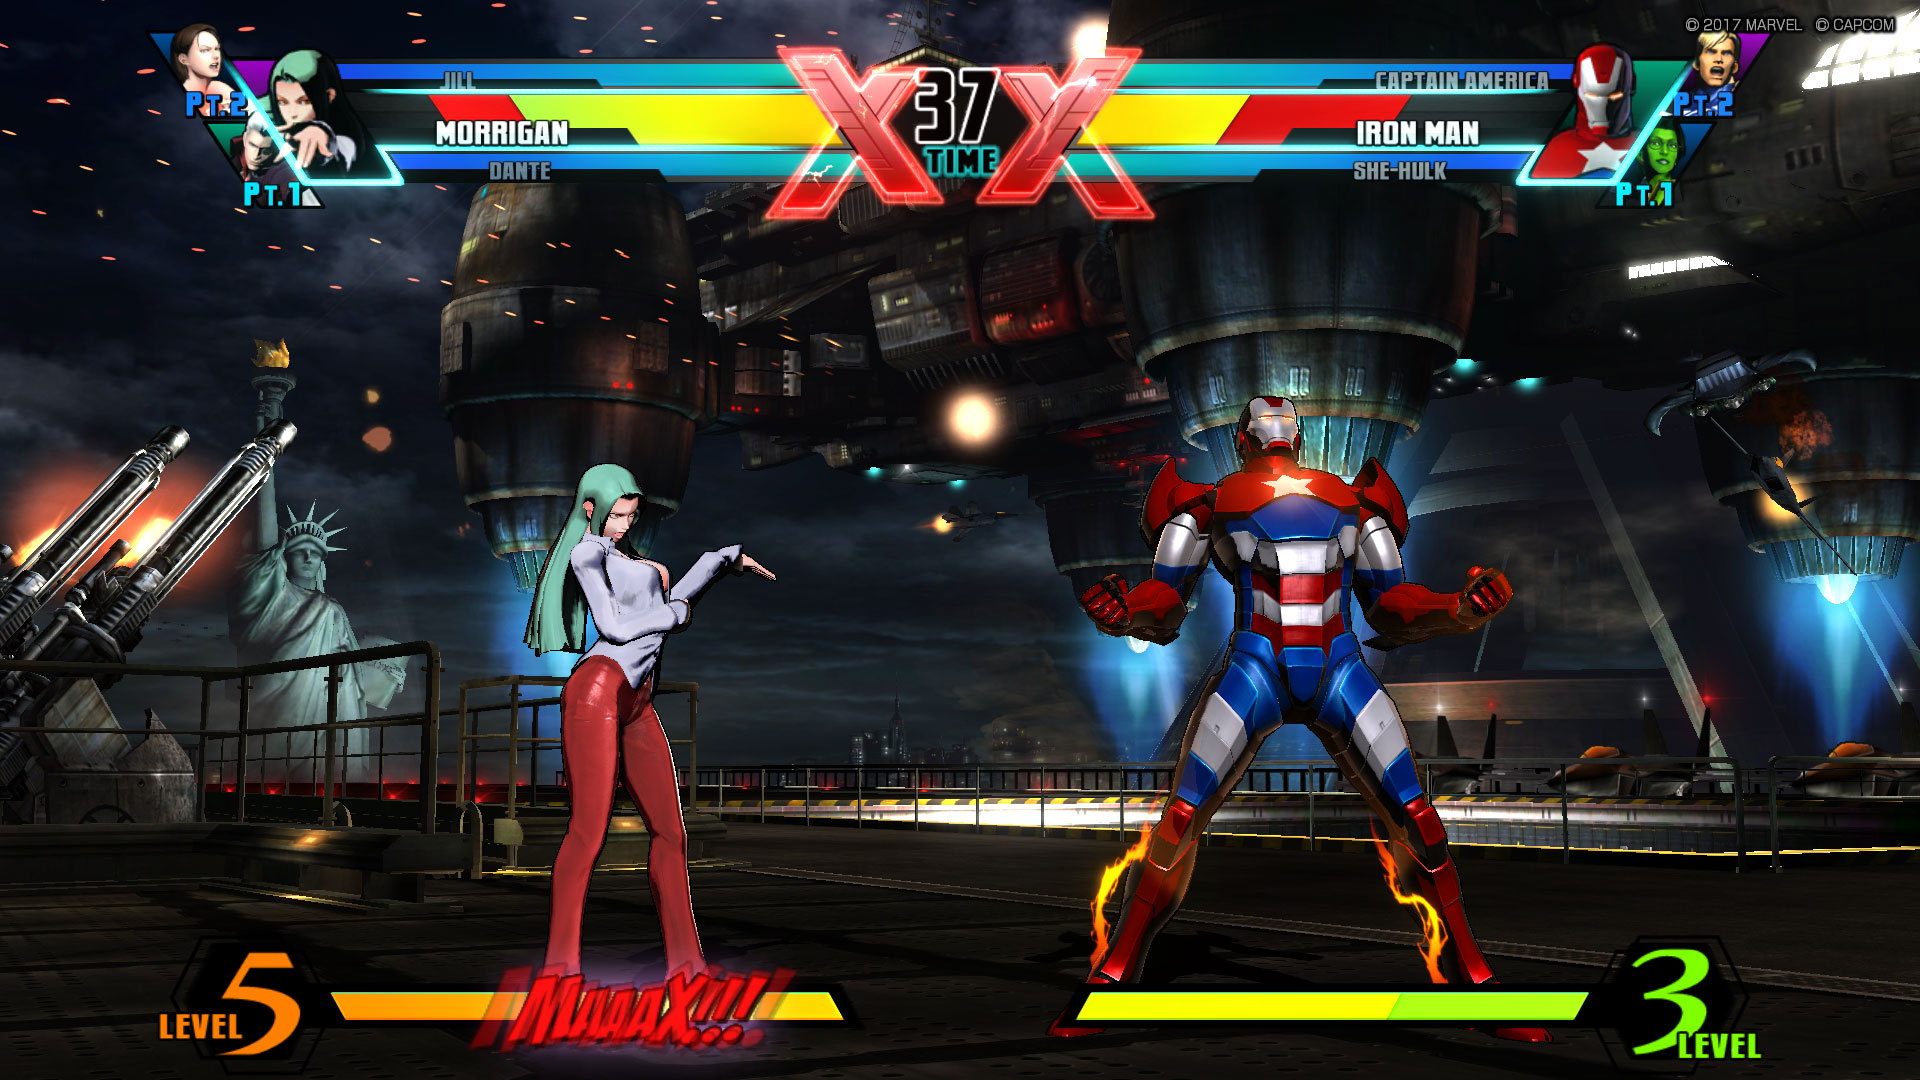 Ultimate Marvel Vs Capcom 3 Indir Dövüş Oyunu Tamindir